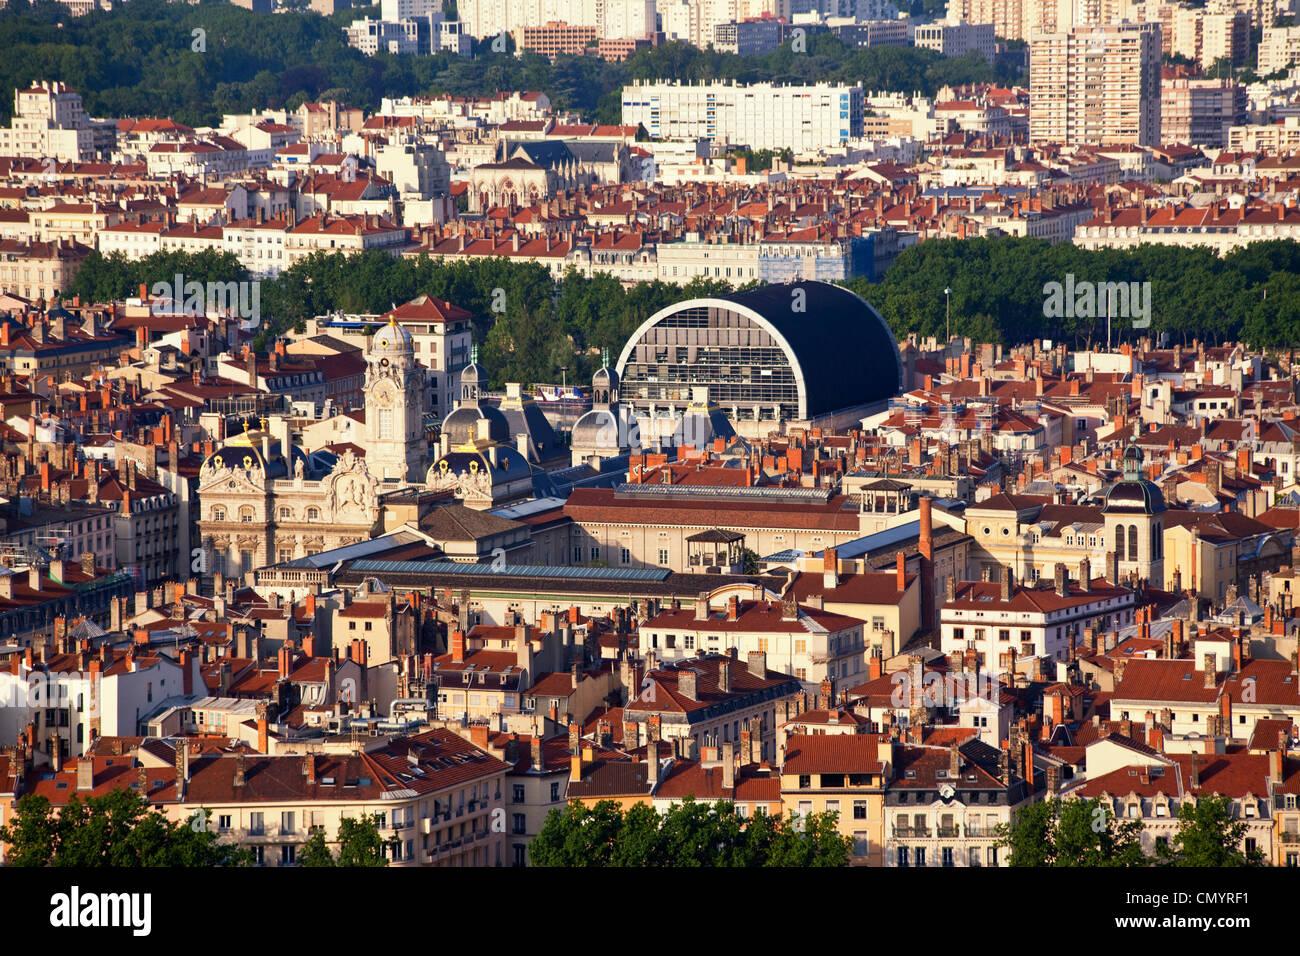 Blick vom Aussichtspunkt von Notre-Dame de Fourvière Hügel, Hotel de Ville, Oper, Lyon, Rhone Alpes, Frankreich Stockbild